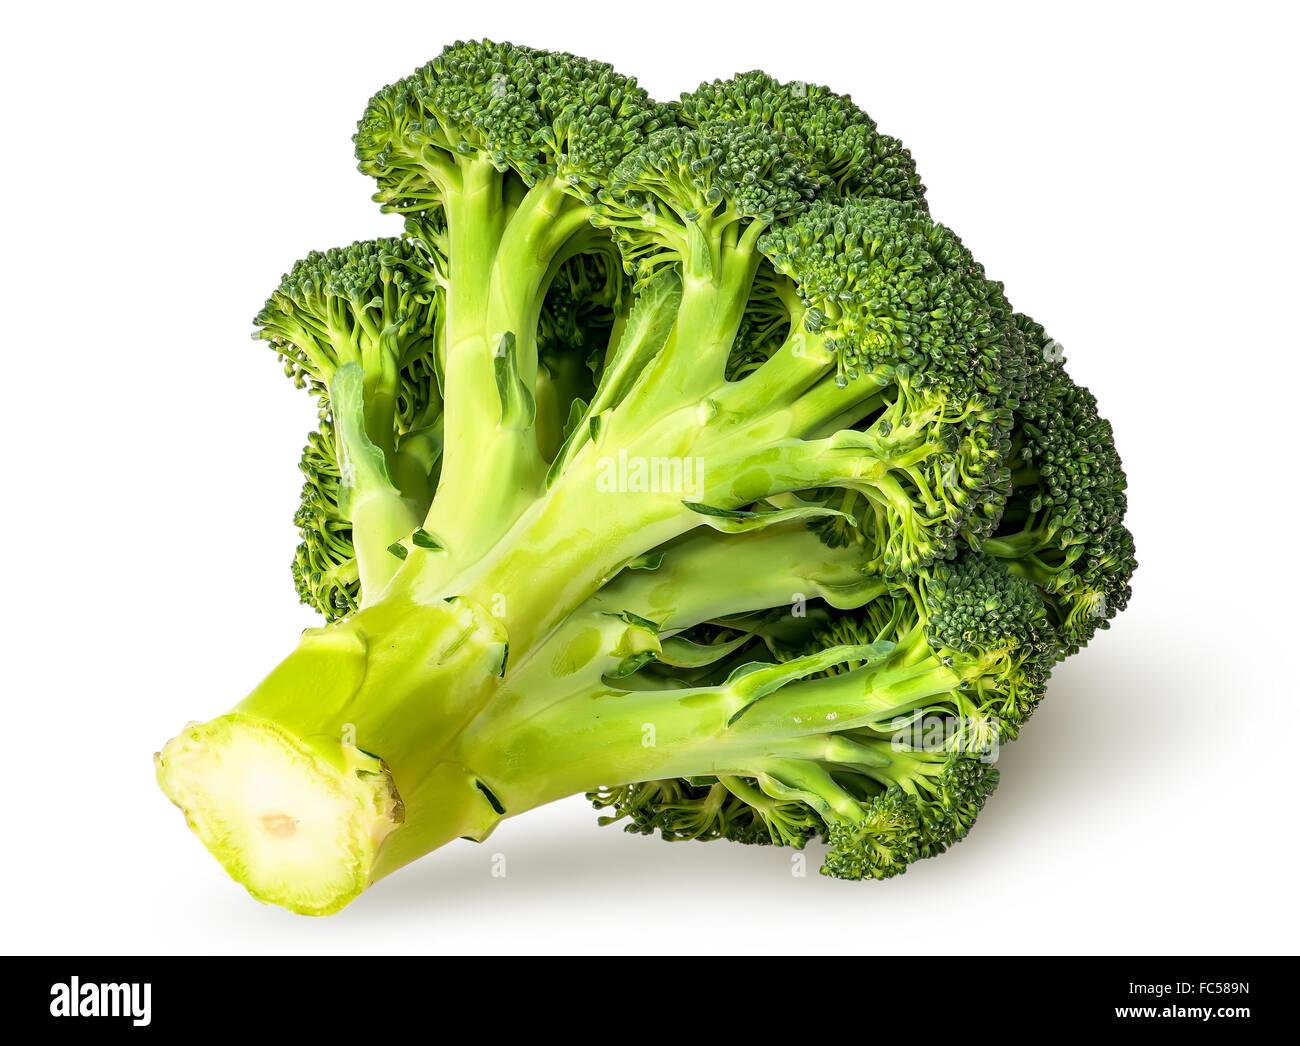 Large inflorescences of fresh broccoli bottom view isolated on white background Stock Photo